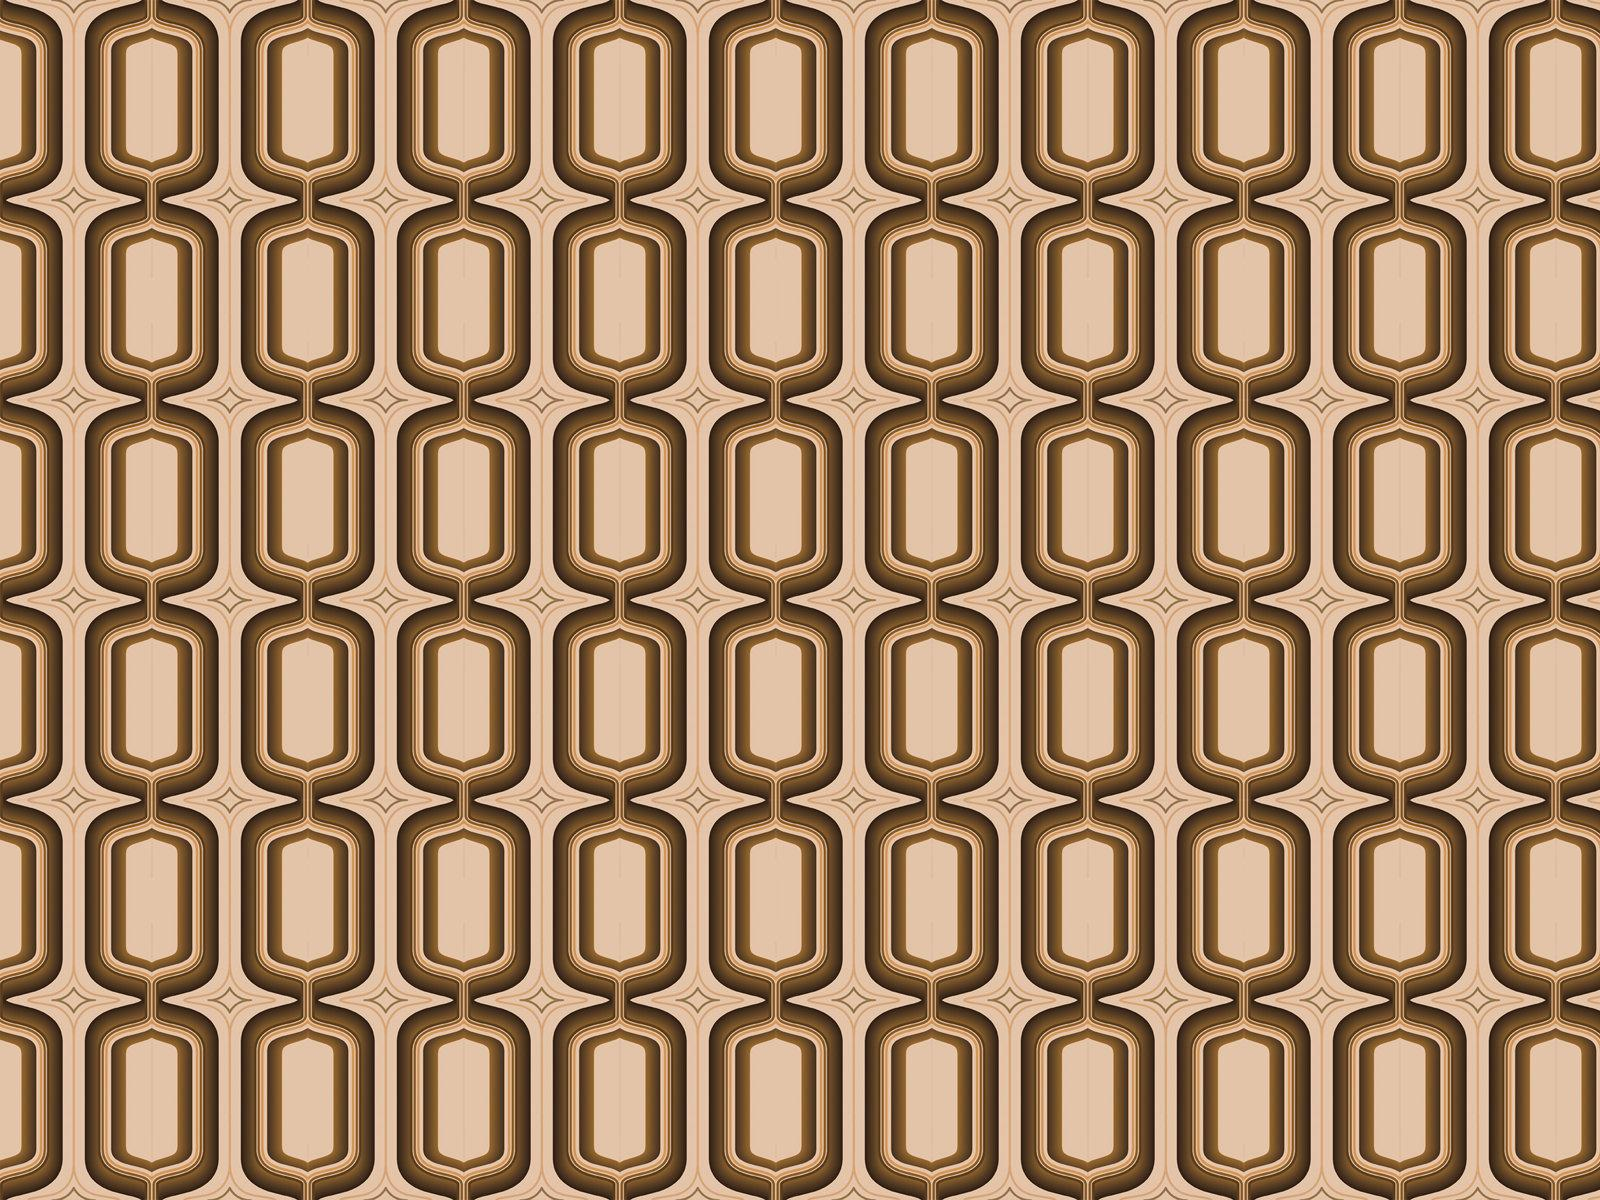 Fall Pixel Art Iphone Wallpaper Hd 1950s Backgrounds Pixelstalk Net